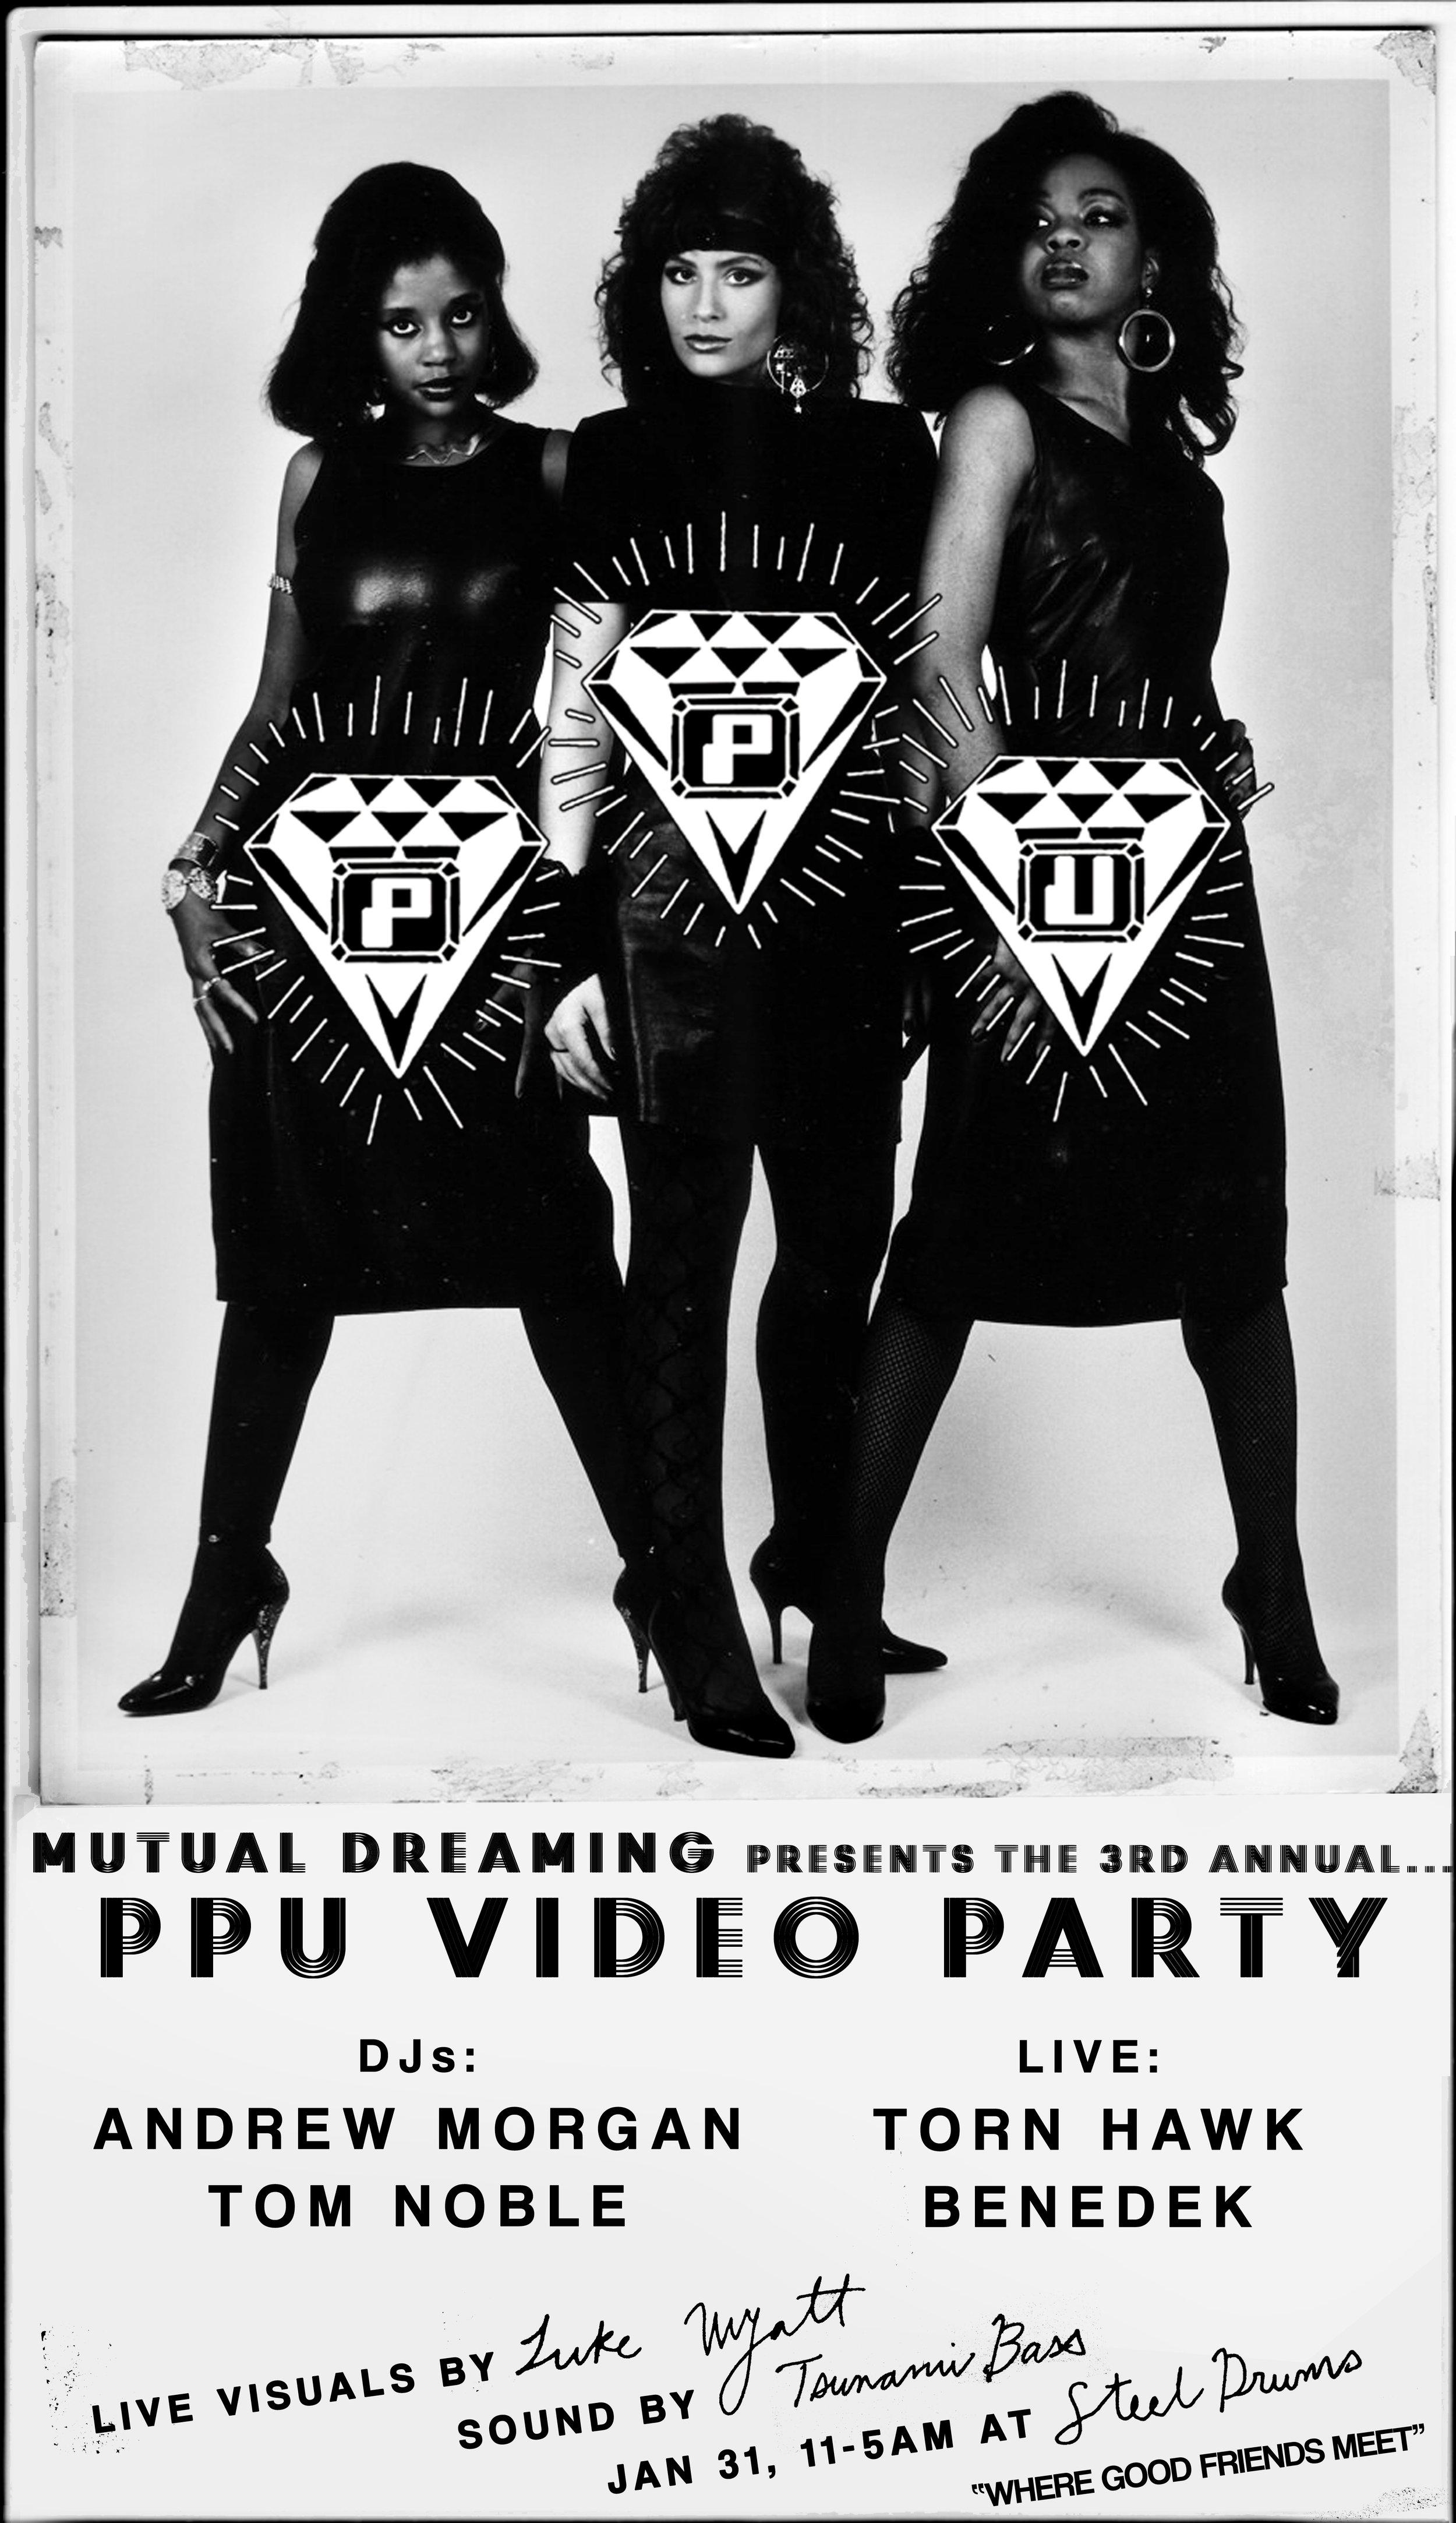 Mutual Dreaming's PPU Video Party Vol 3: Andrew Morgan, Torn Hawk, Benedek, Tom Noble  January 2014